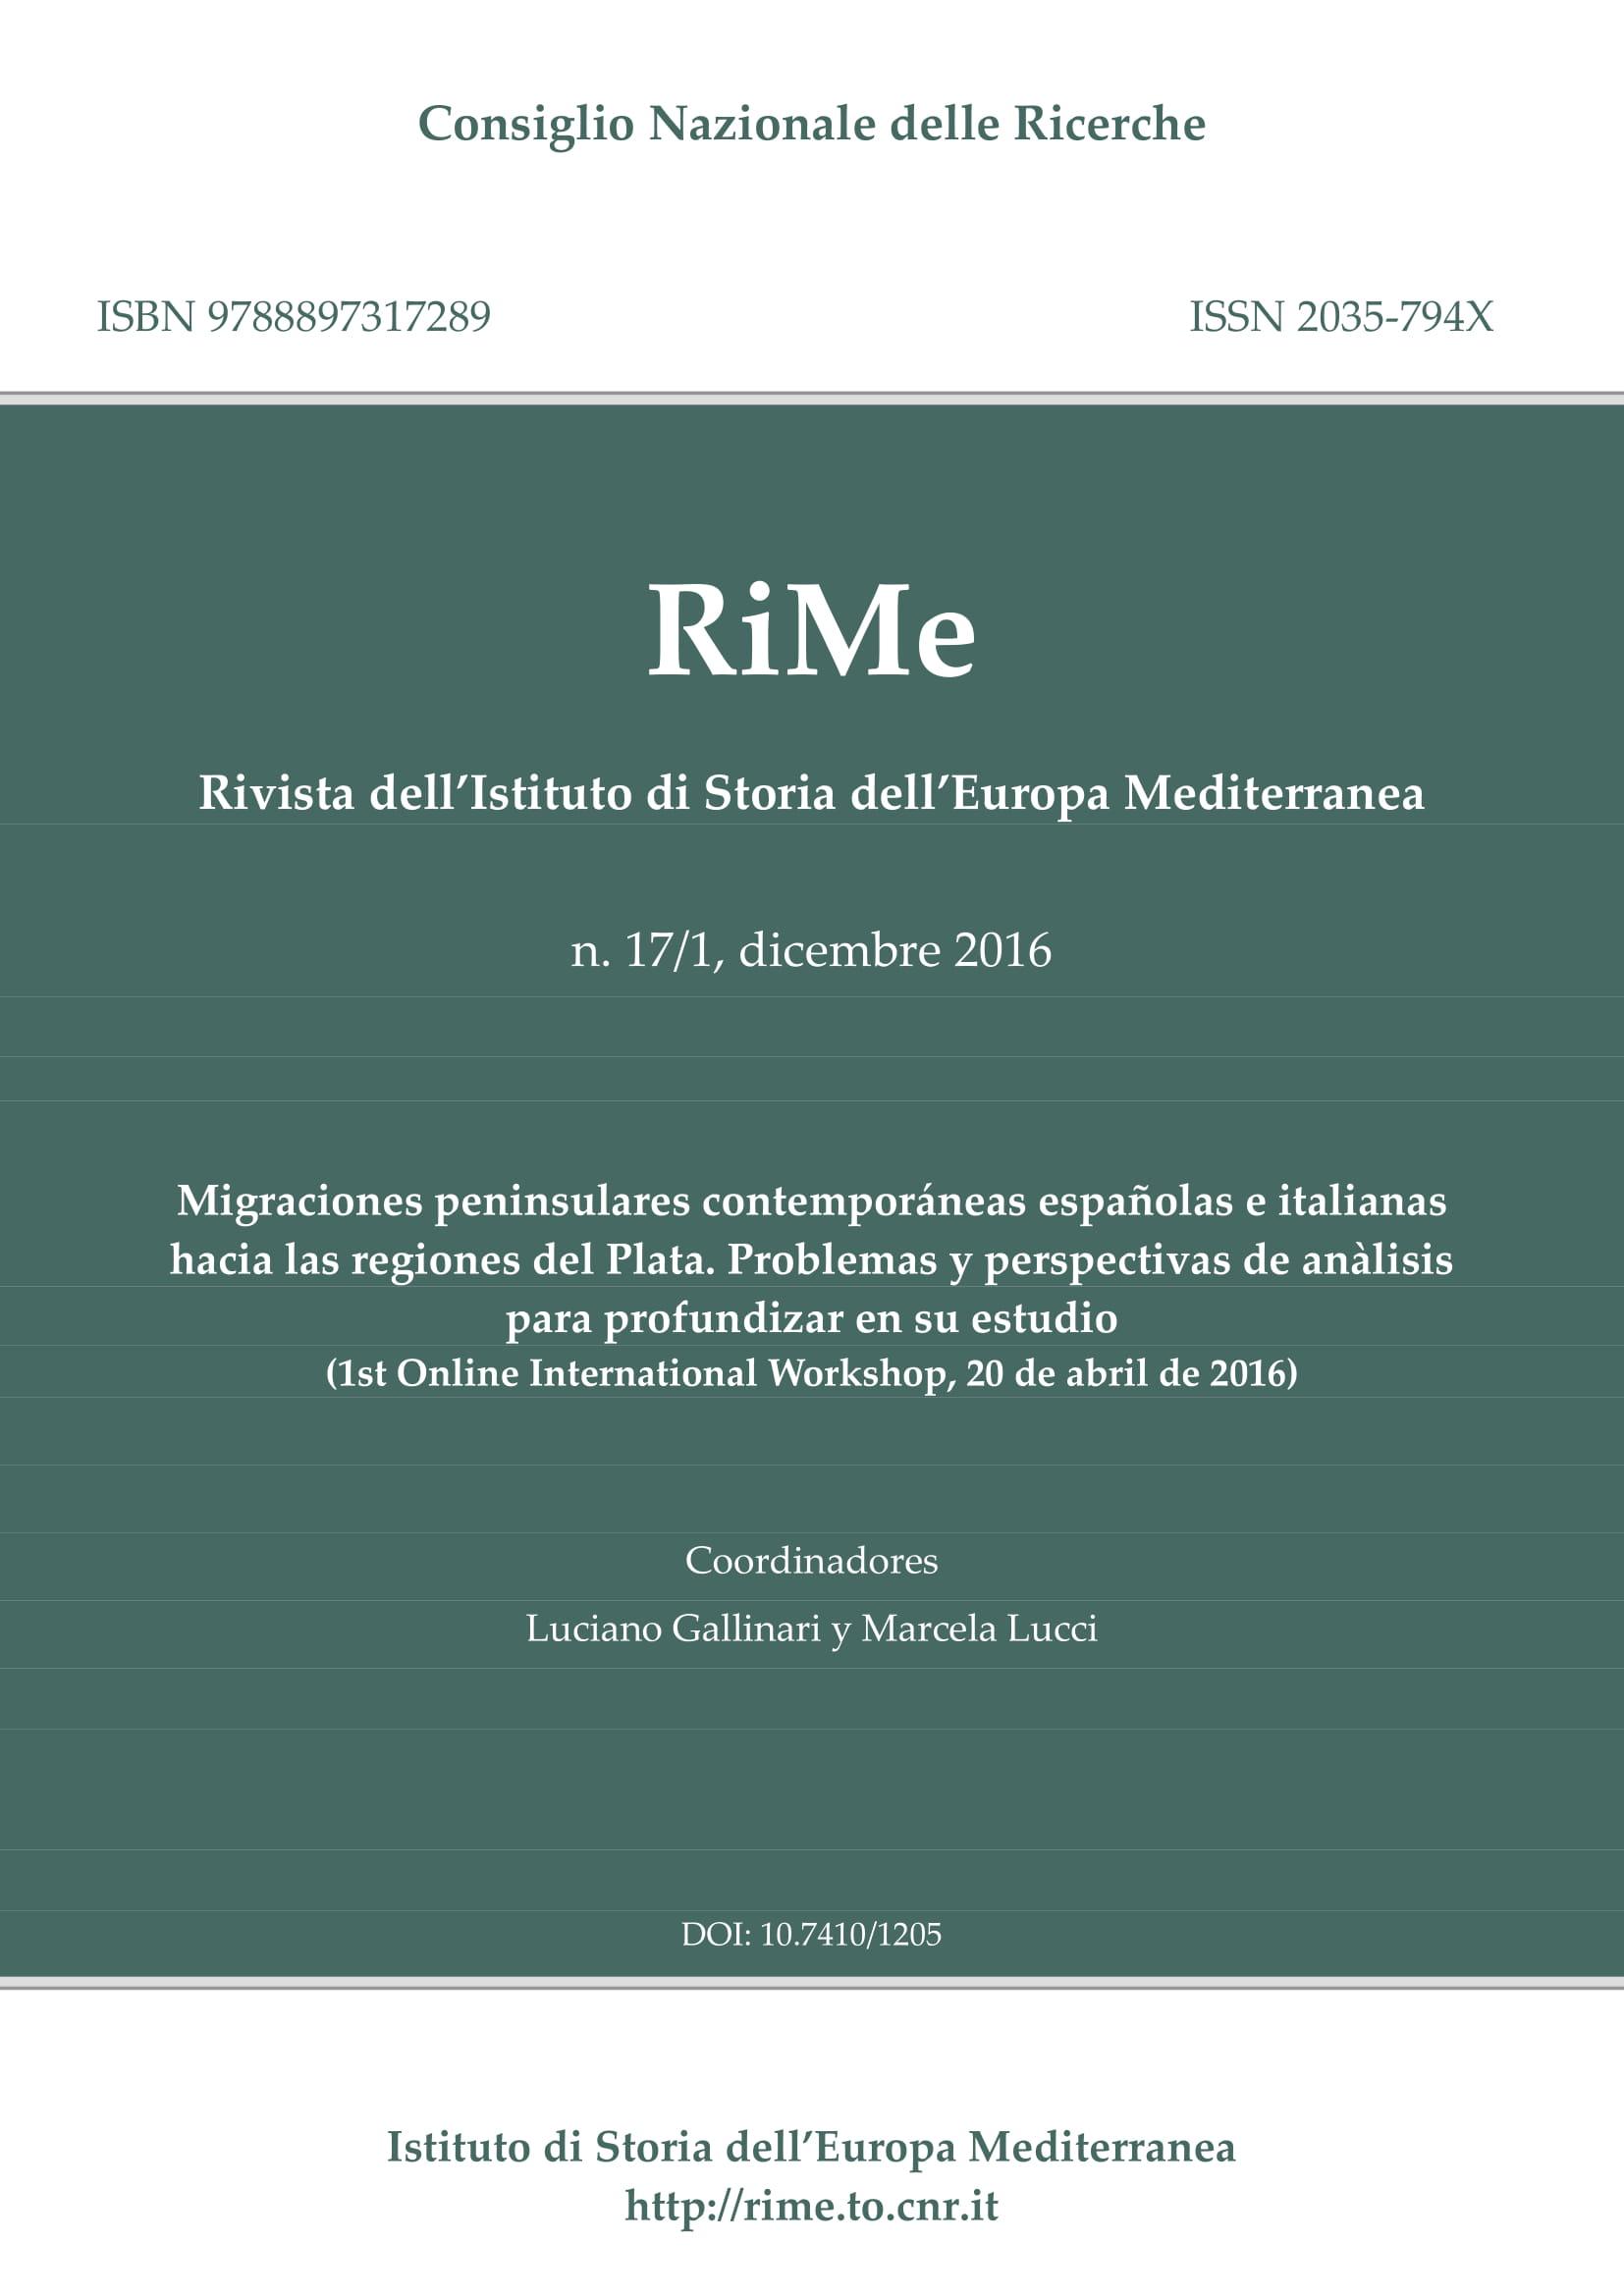 Vol. 17/1 (December 2016) cover